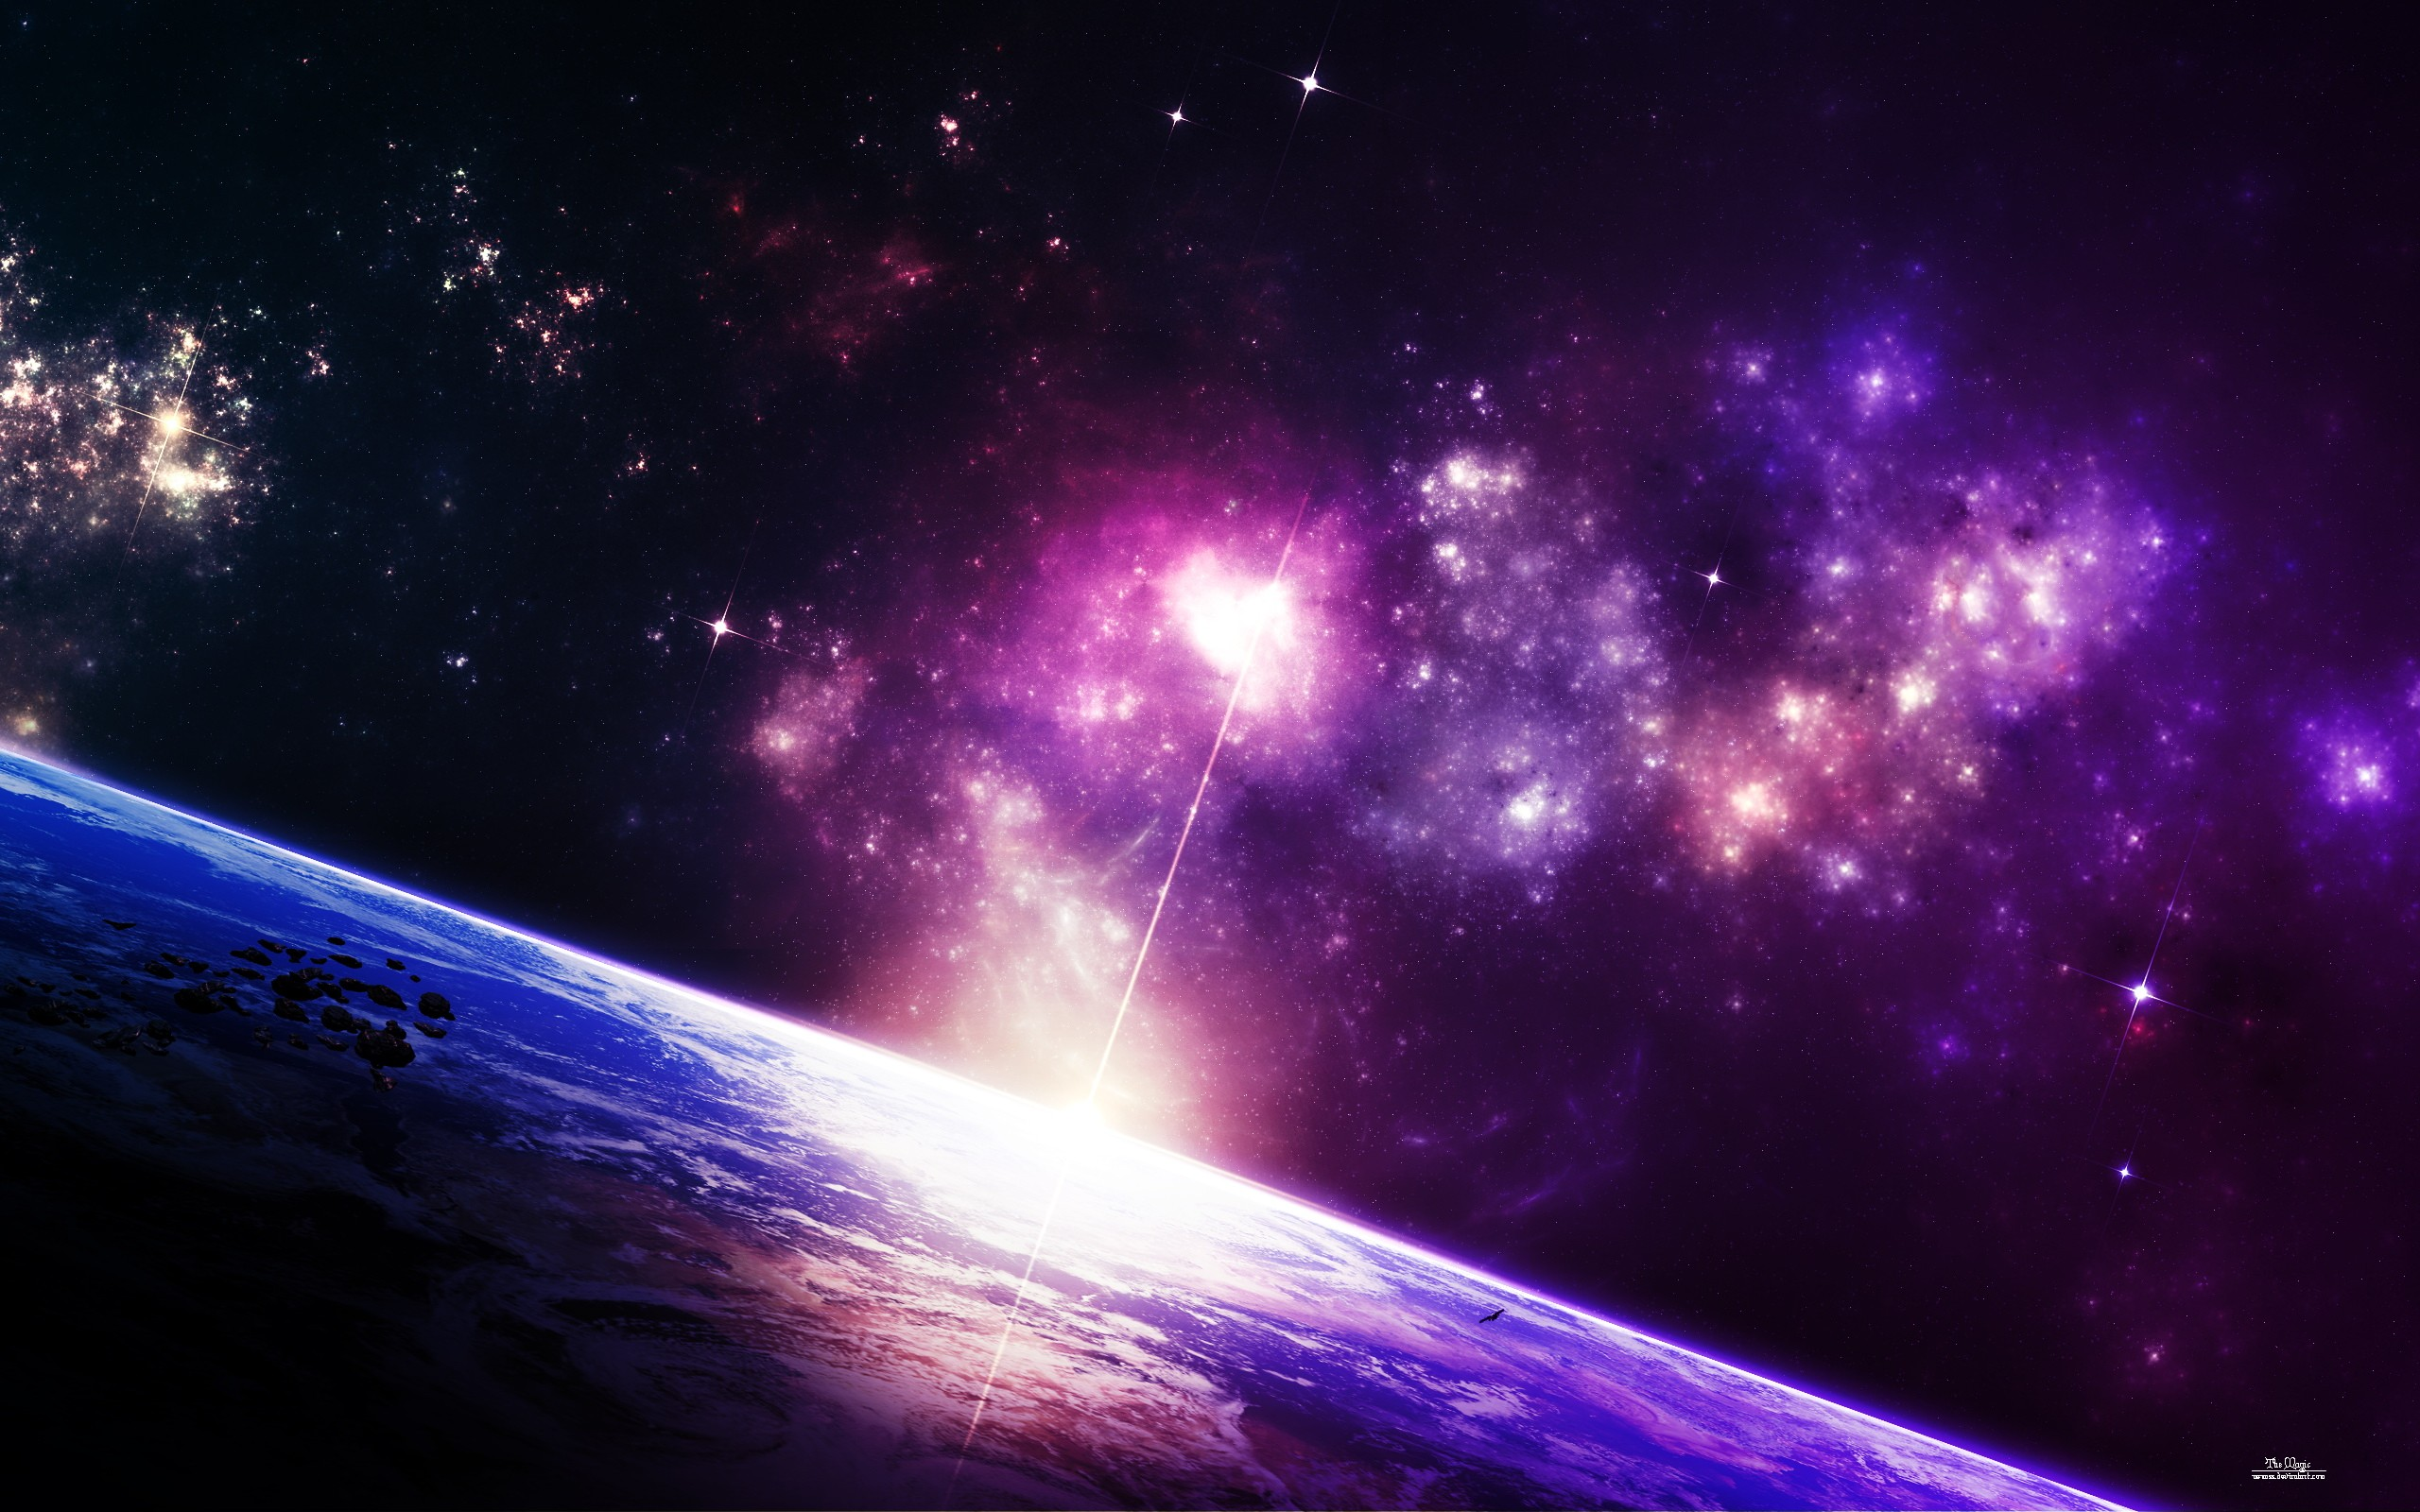 General 2560x1600 space space art planet digital art